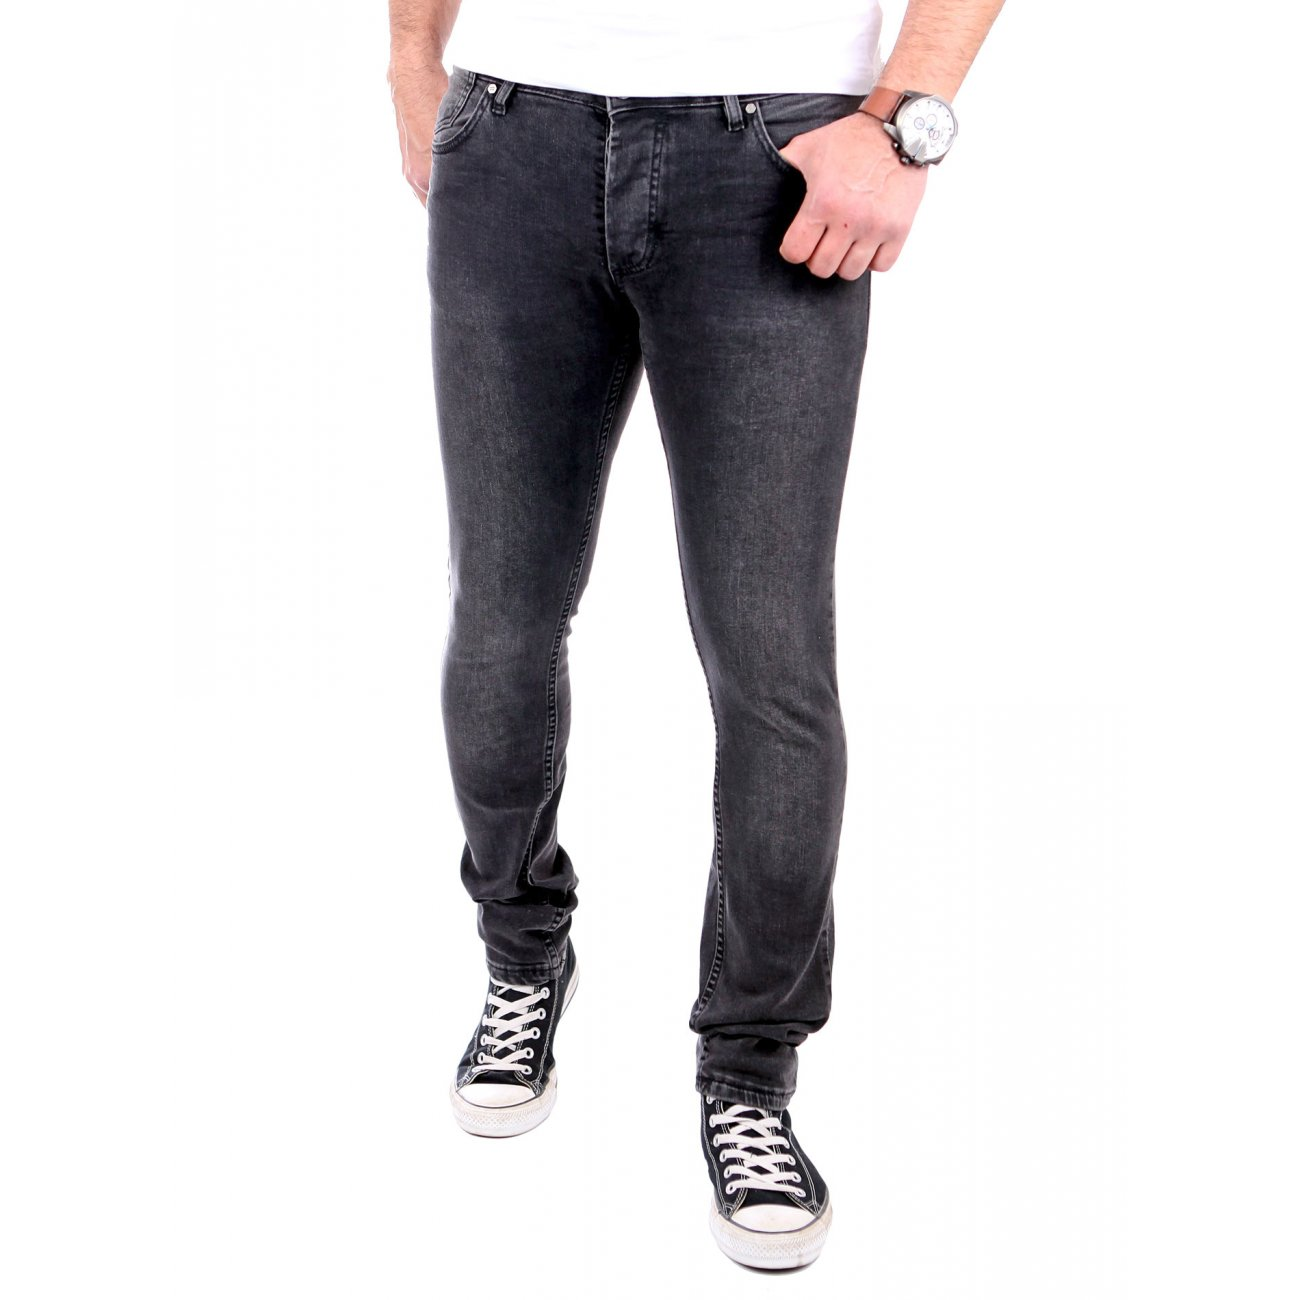 tazzio jeans used look slim fit strech tz 16519 schwarz. Black Bedroom Furniture Sets. Home Design Ideas